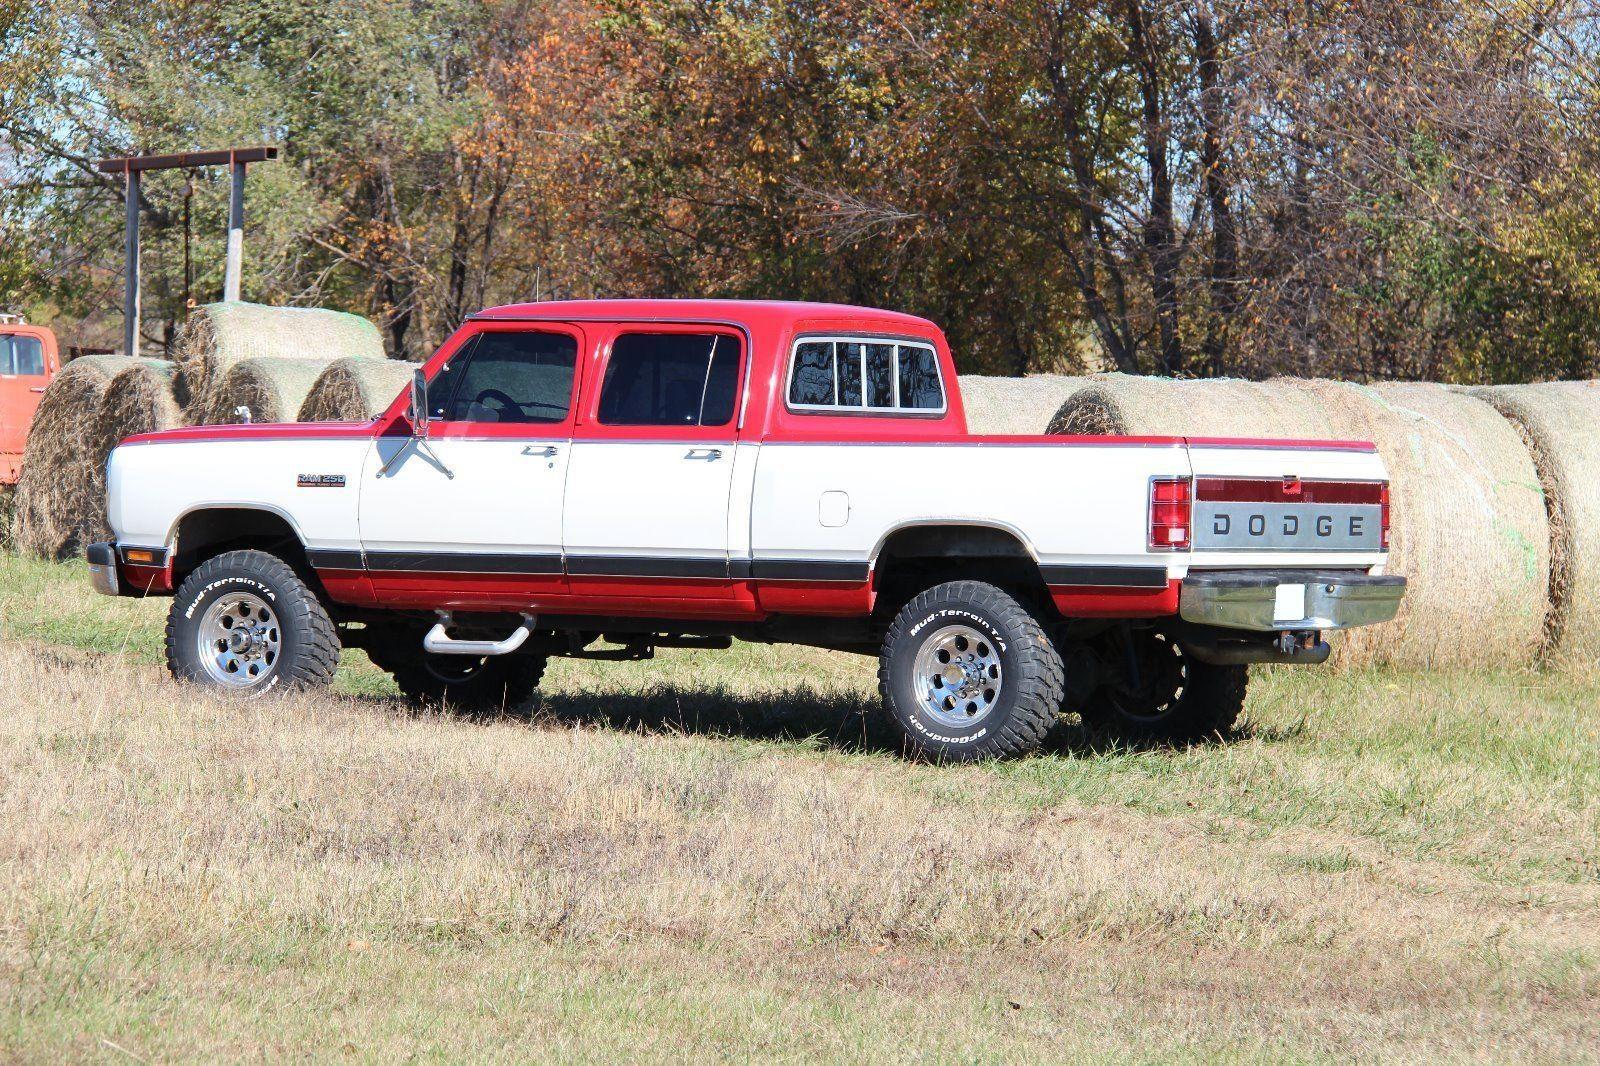 1984 Dodge Ram - Overview - CarGurus